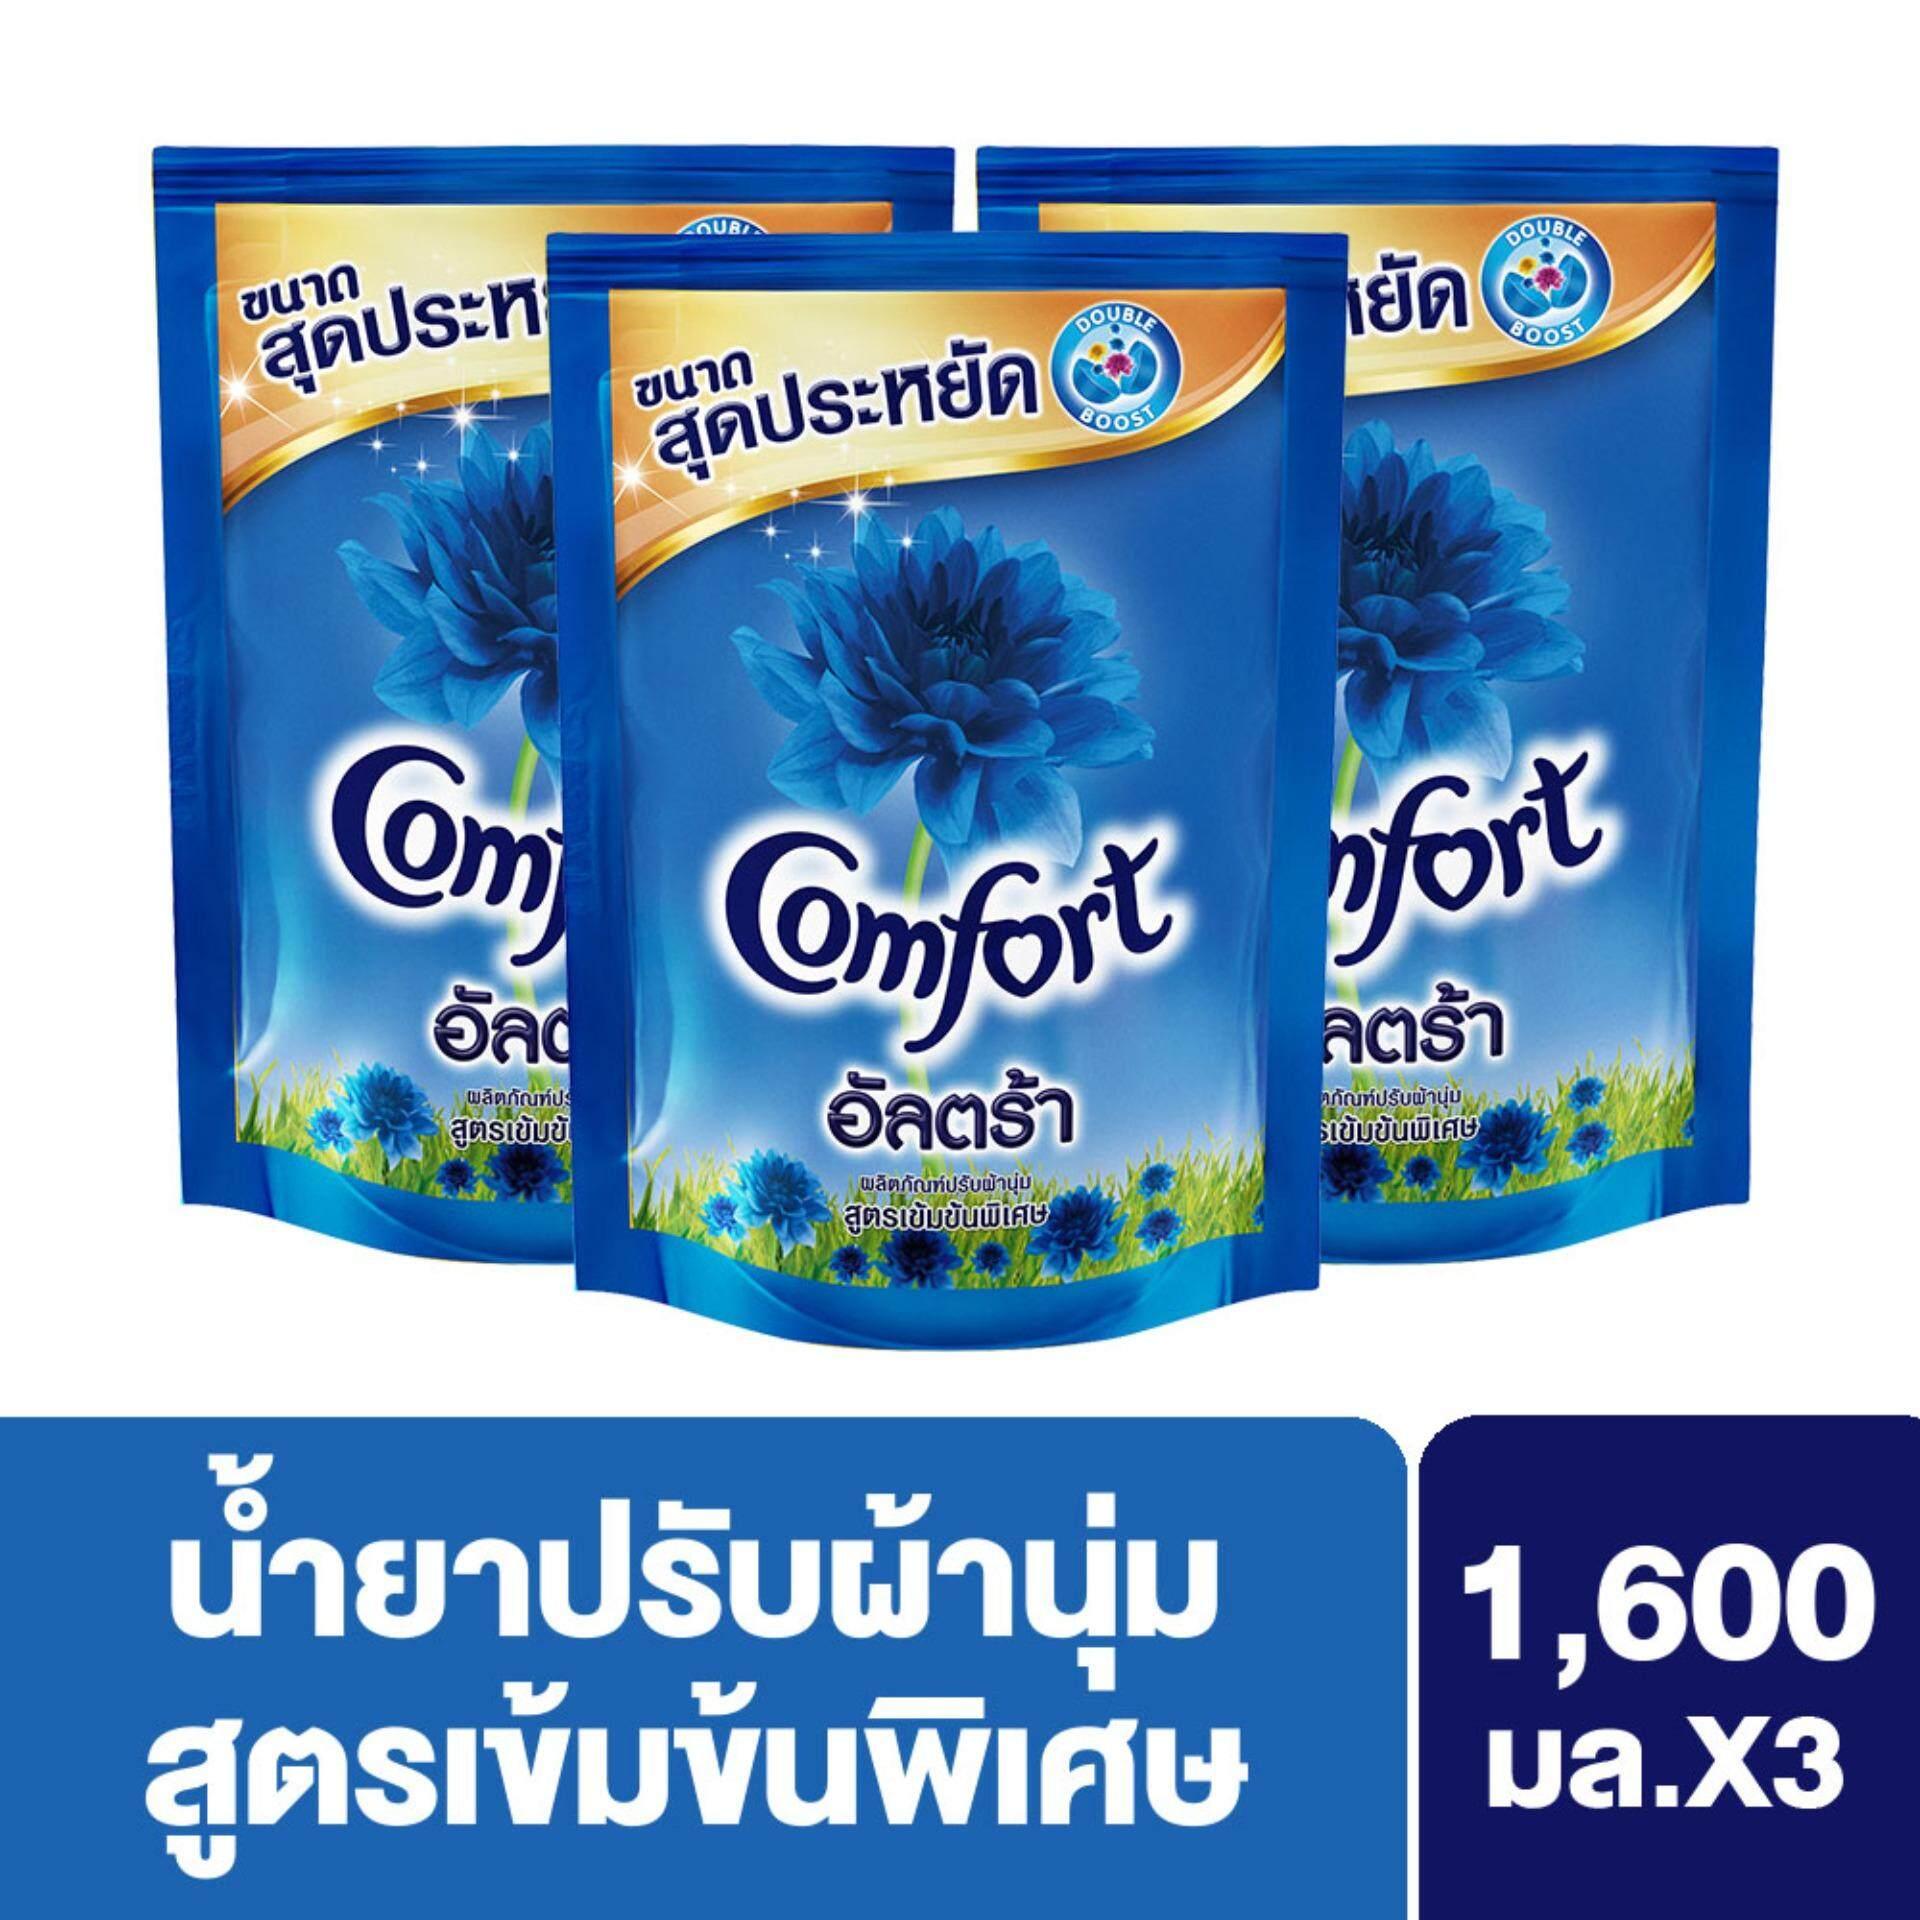 Comfort Ultra Fabric Softener Blue 1600 Ml. คอมฟอร์ท อัลตร้า น้ำยาปรับผ้านุ่ม สีฟ้า 1600 มล. X3 By Lazada Retail Unilever Home.